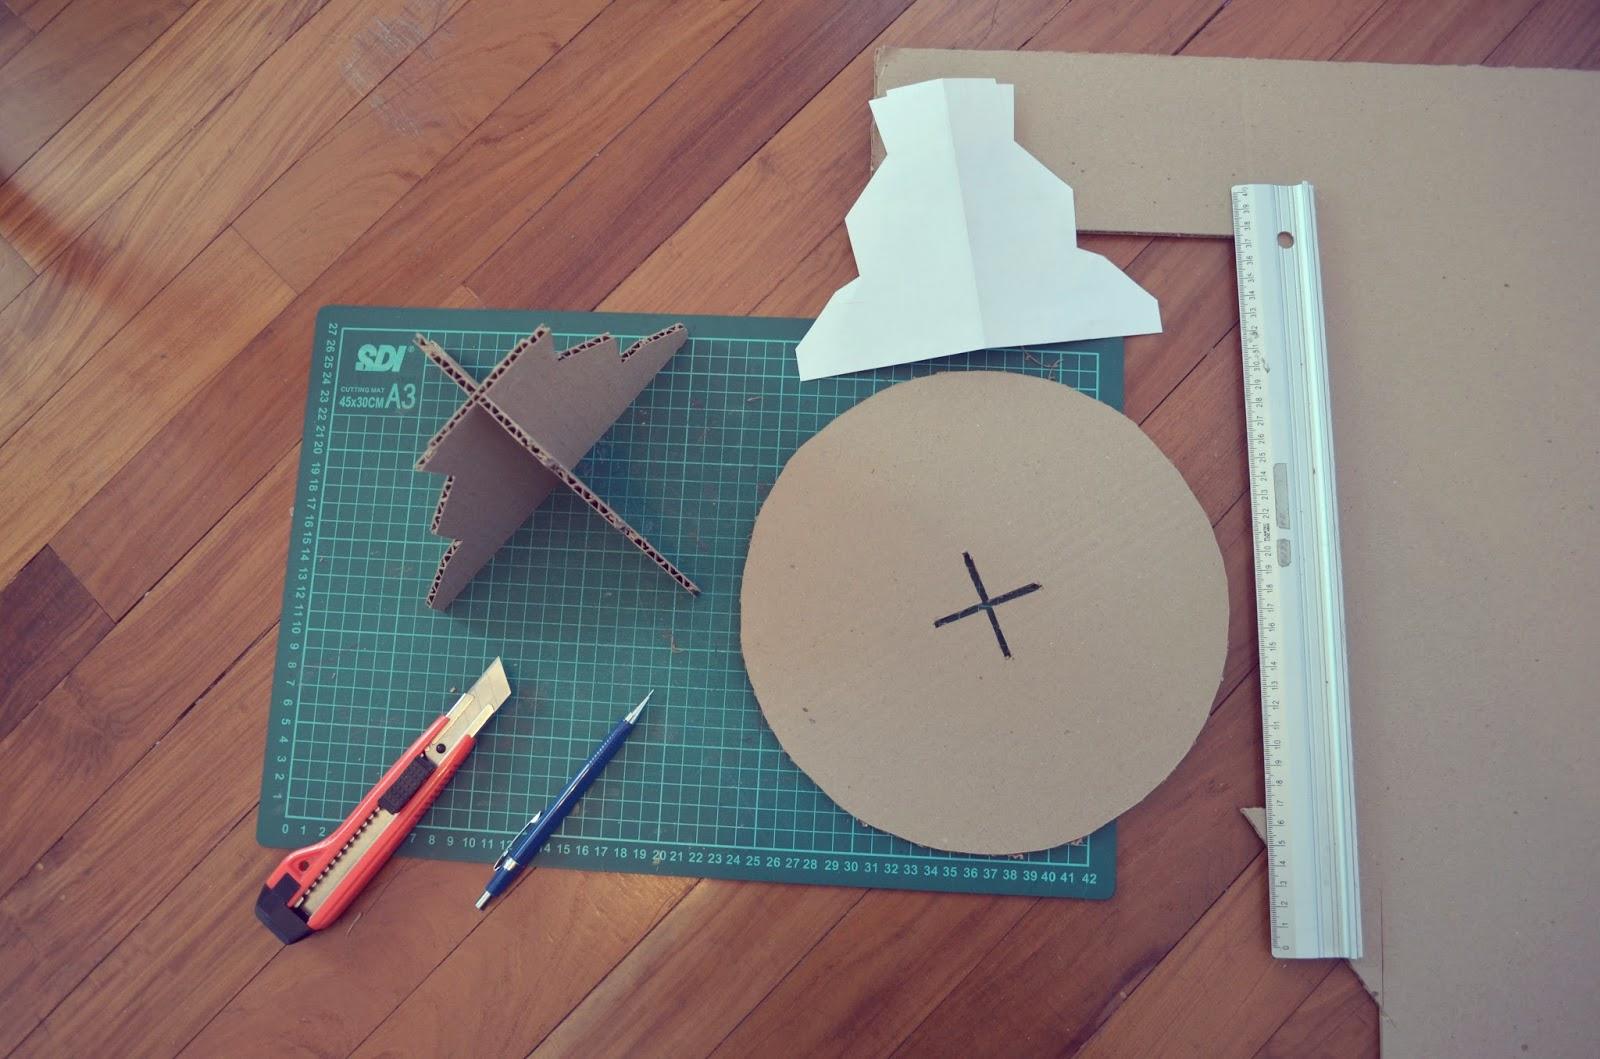 Soporte para tortas - ✄ con molde para descargar - Handbox Craft ...